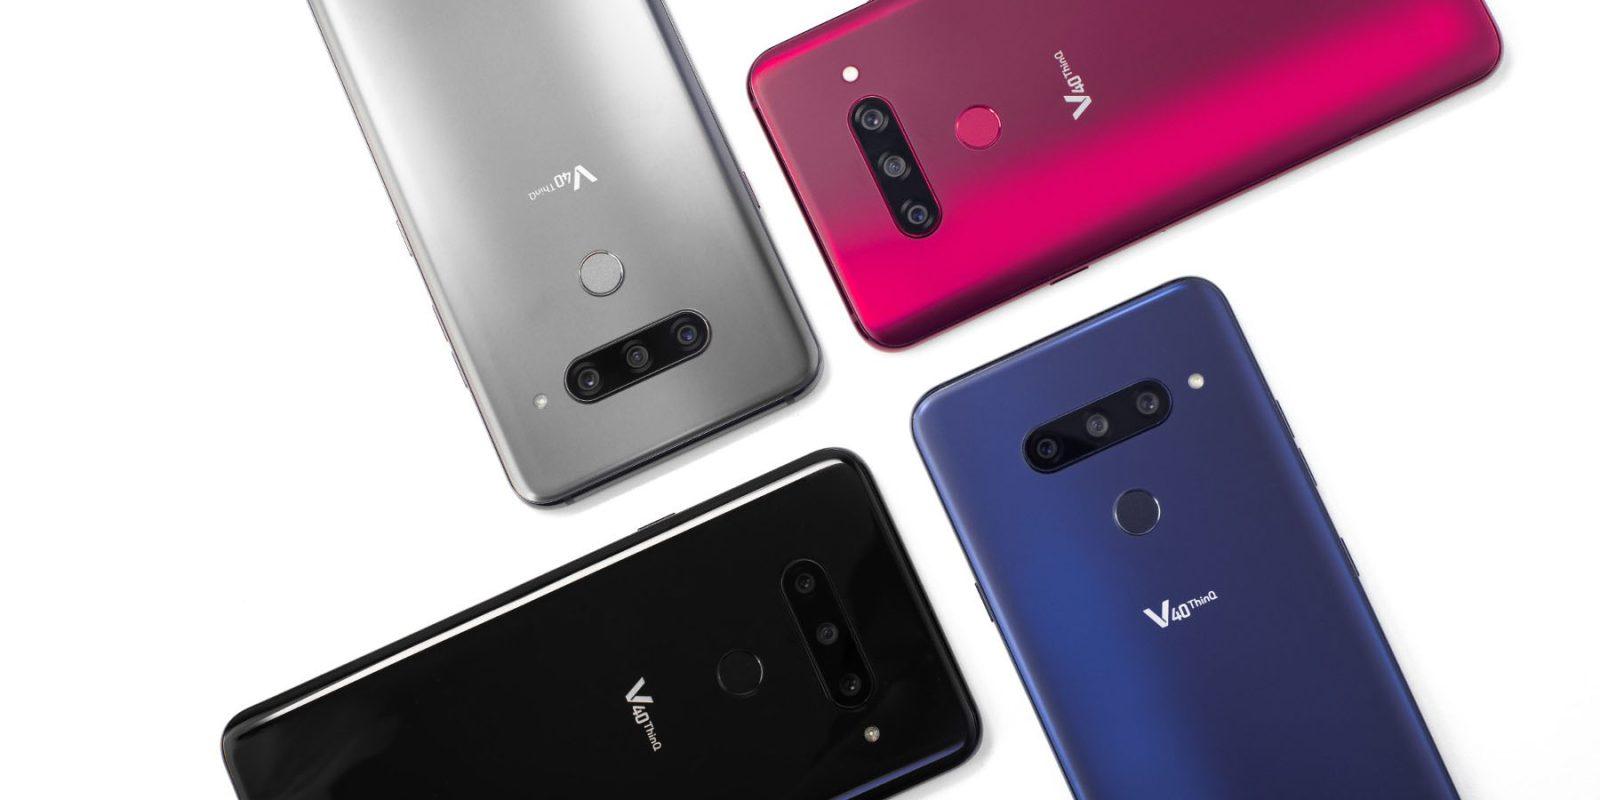 lg-v40-thinq-smartphone-5-kamera-dengan-layar-64-inci-dan-snapdragon-845